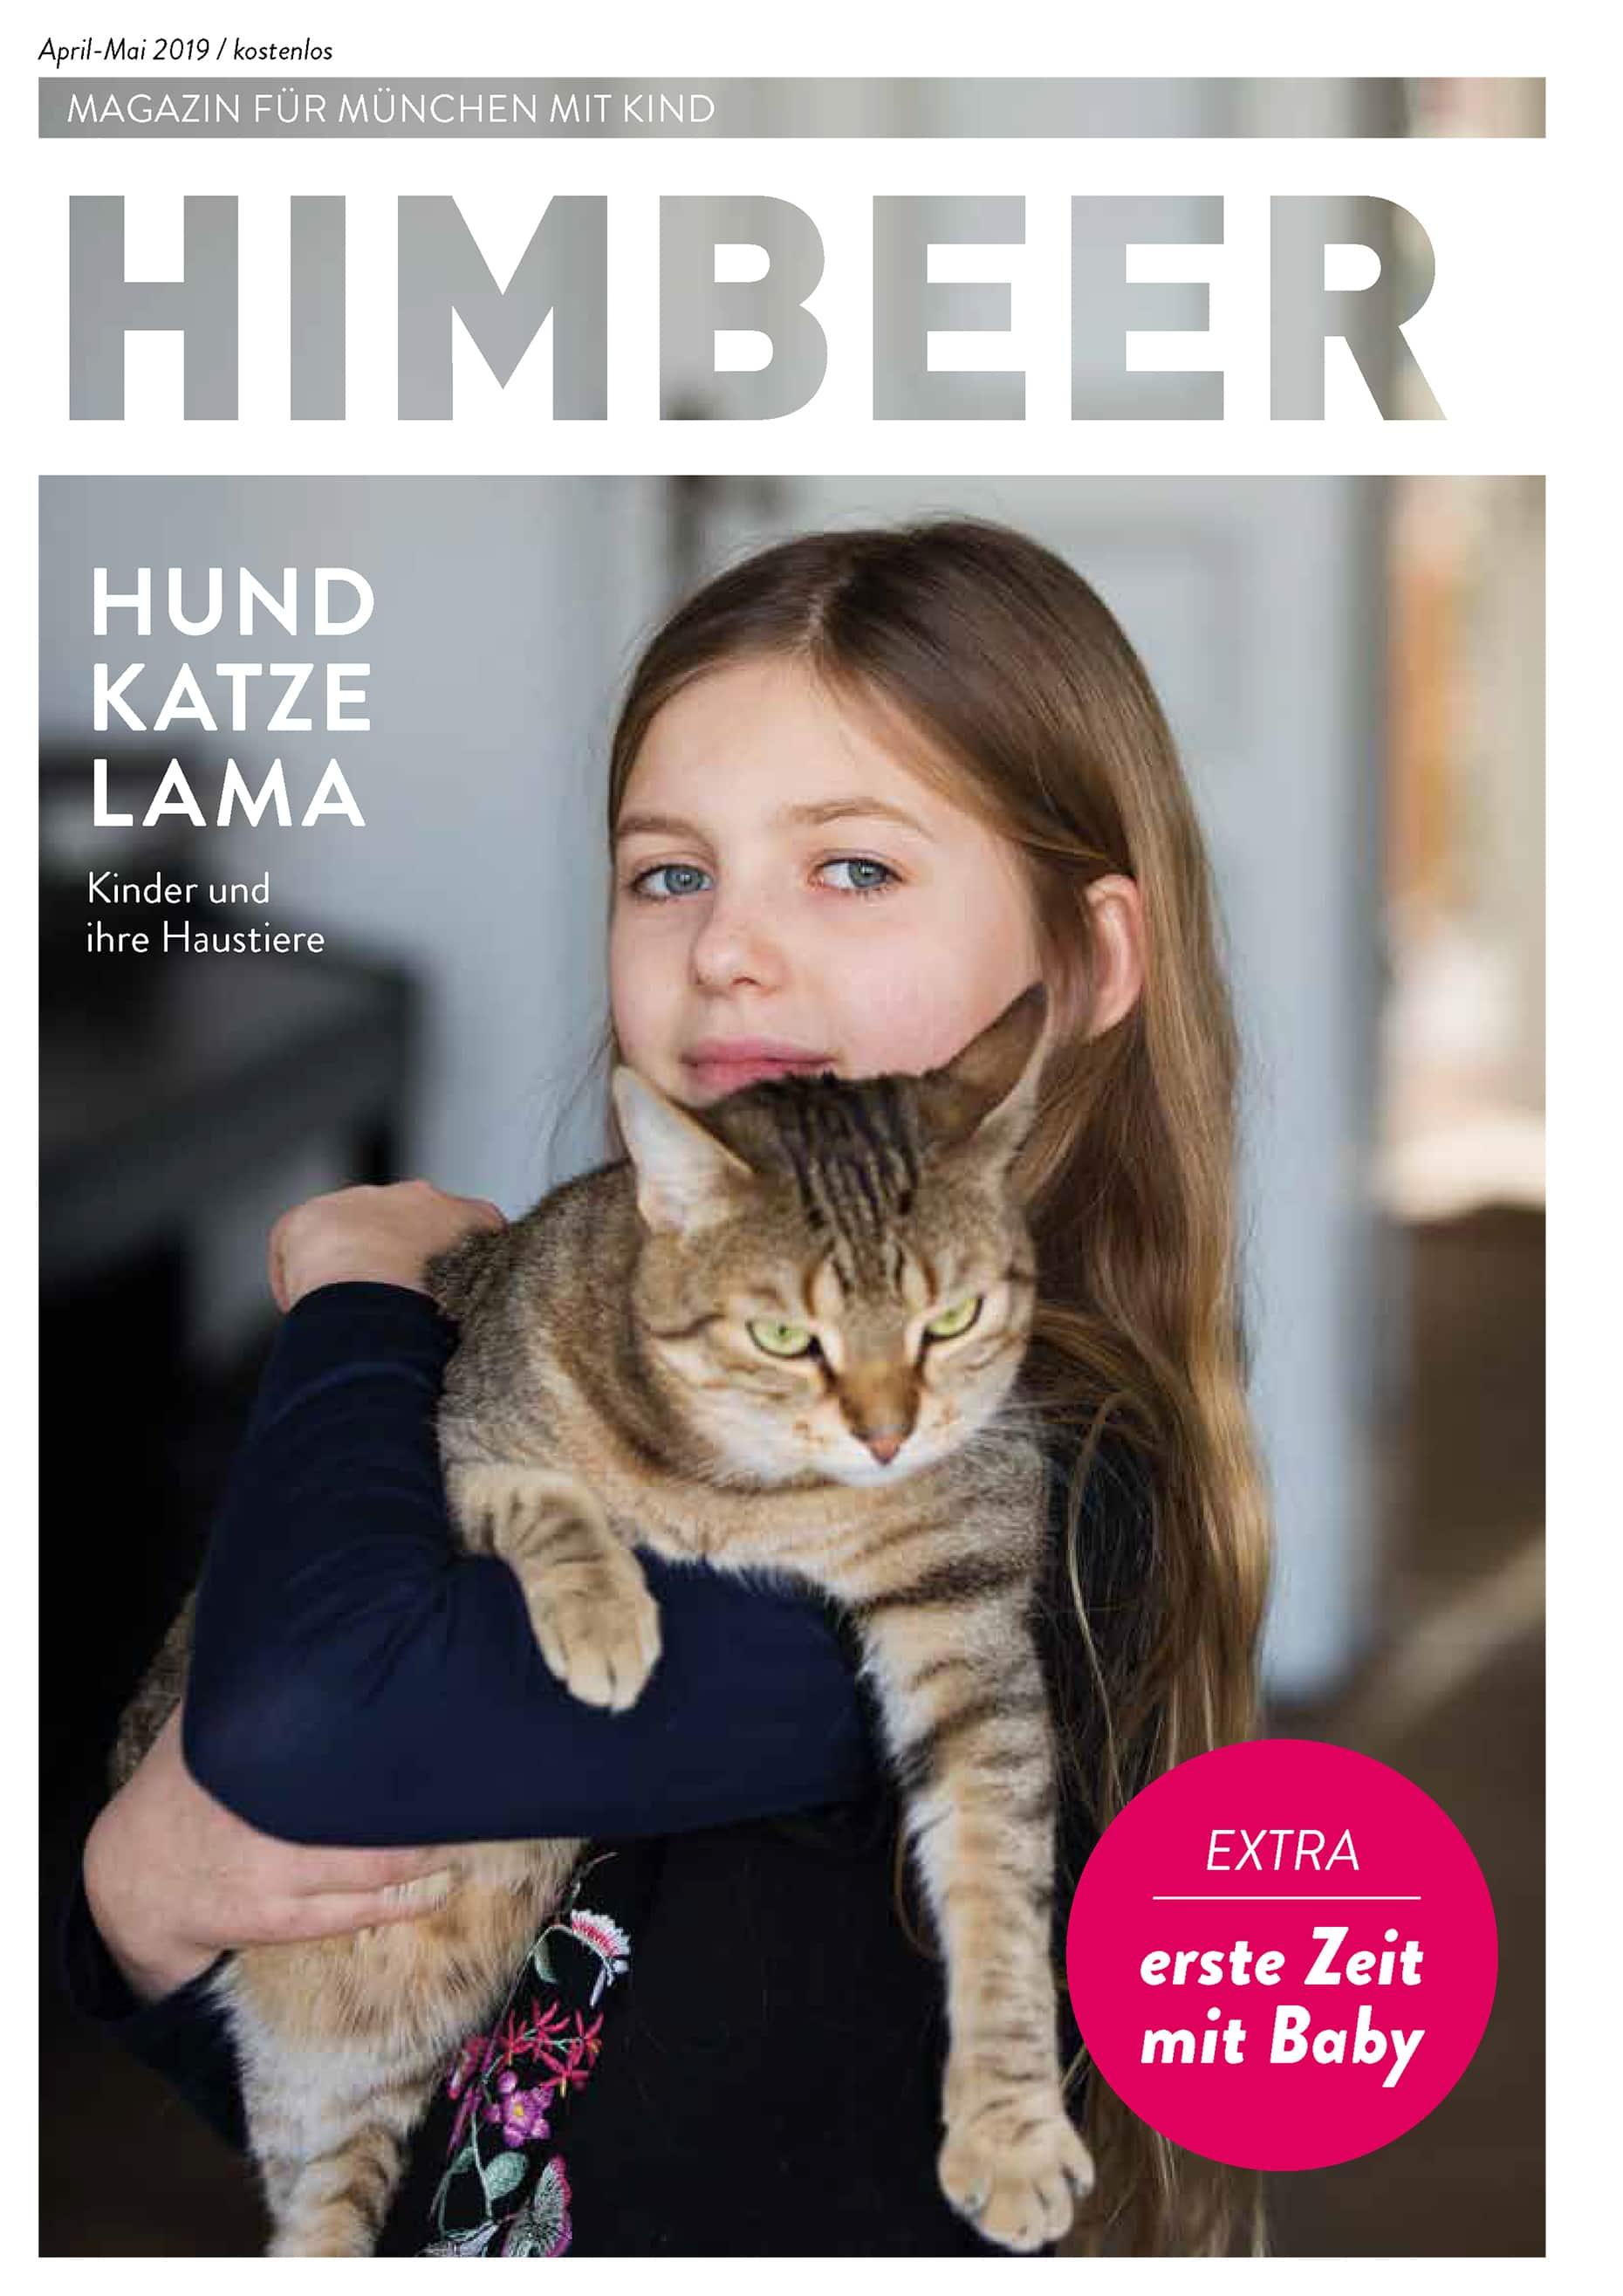 HIMBEER Magazin für München mit Kind April-Mai 2019 // HIMBEER